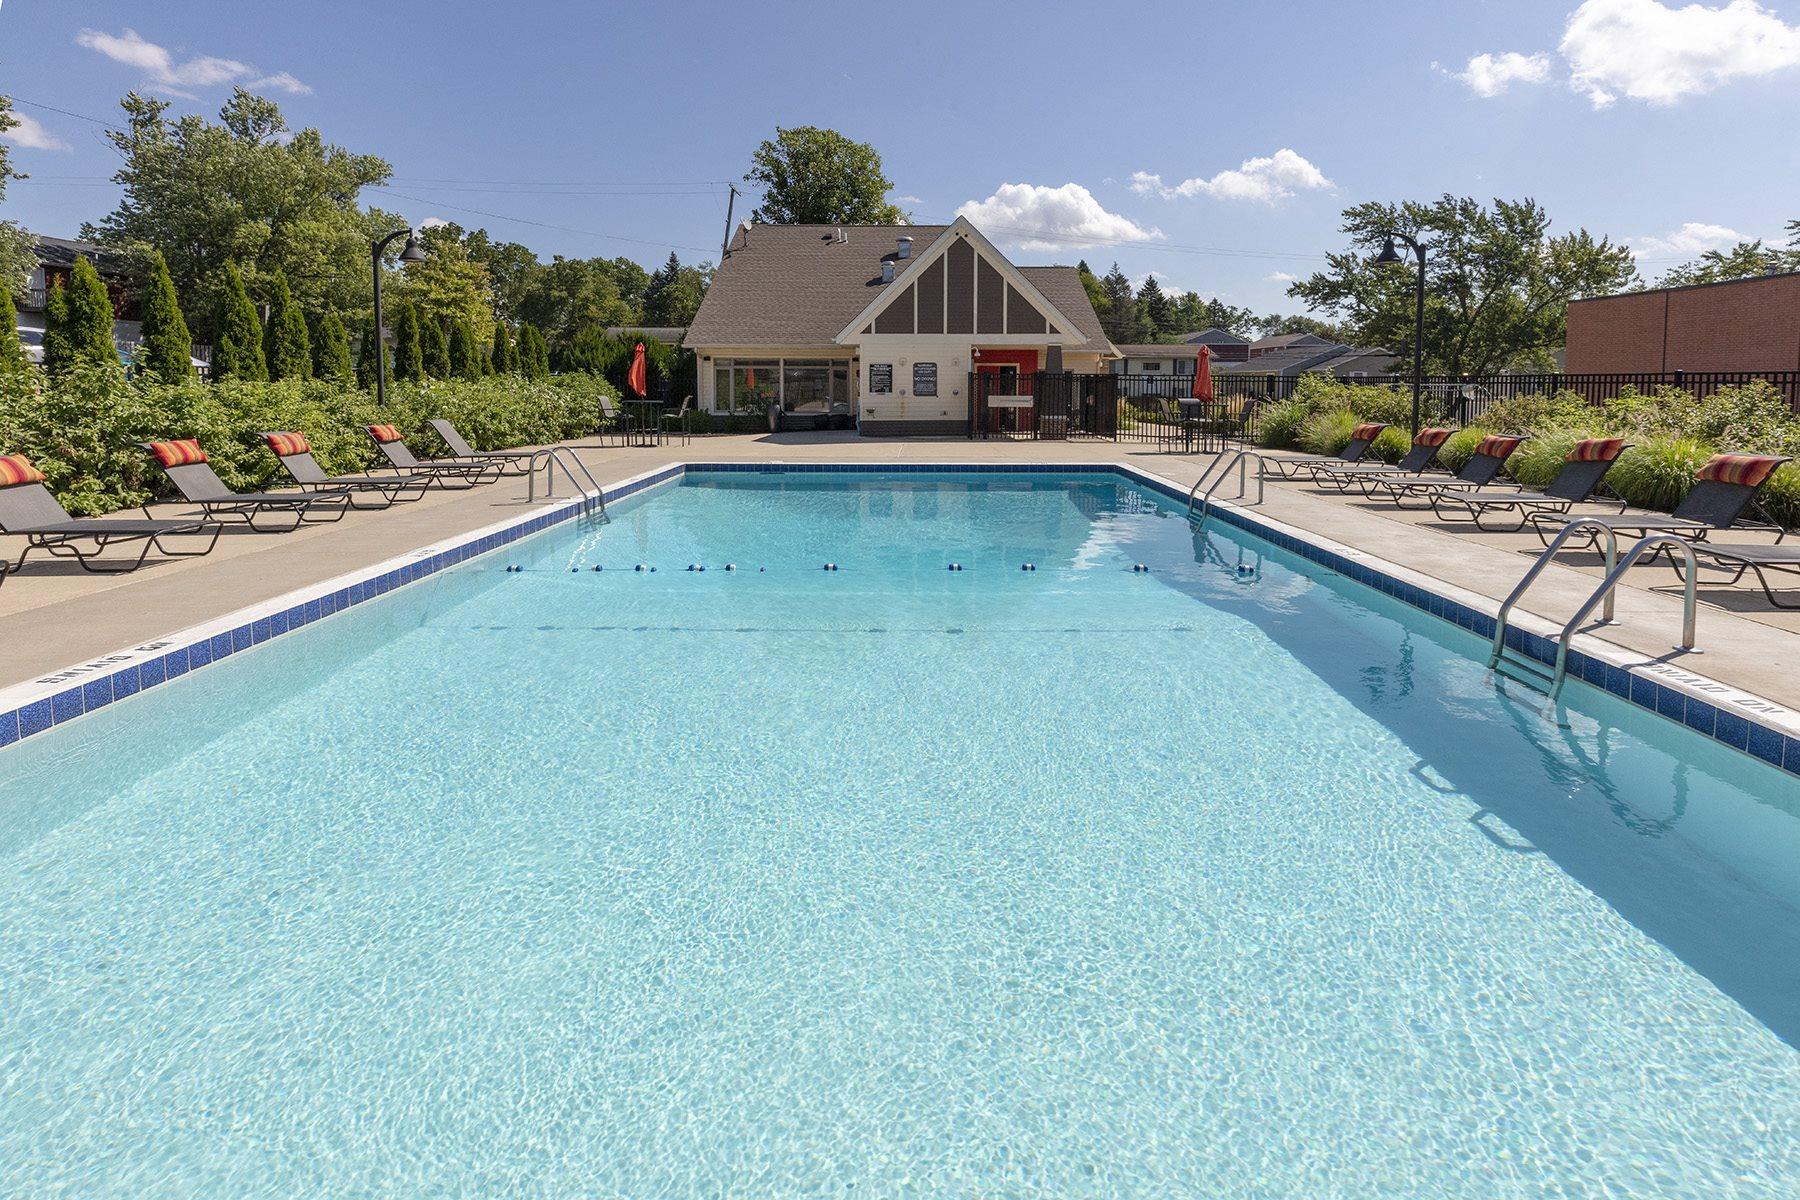 Pool and Sundeck at Arcadia Grove Apartments in Kalamazoo MI